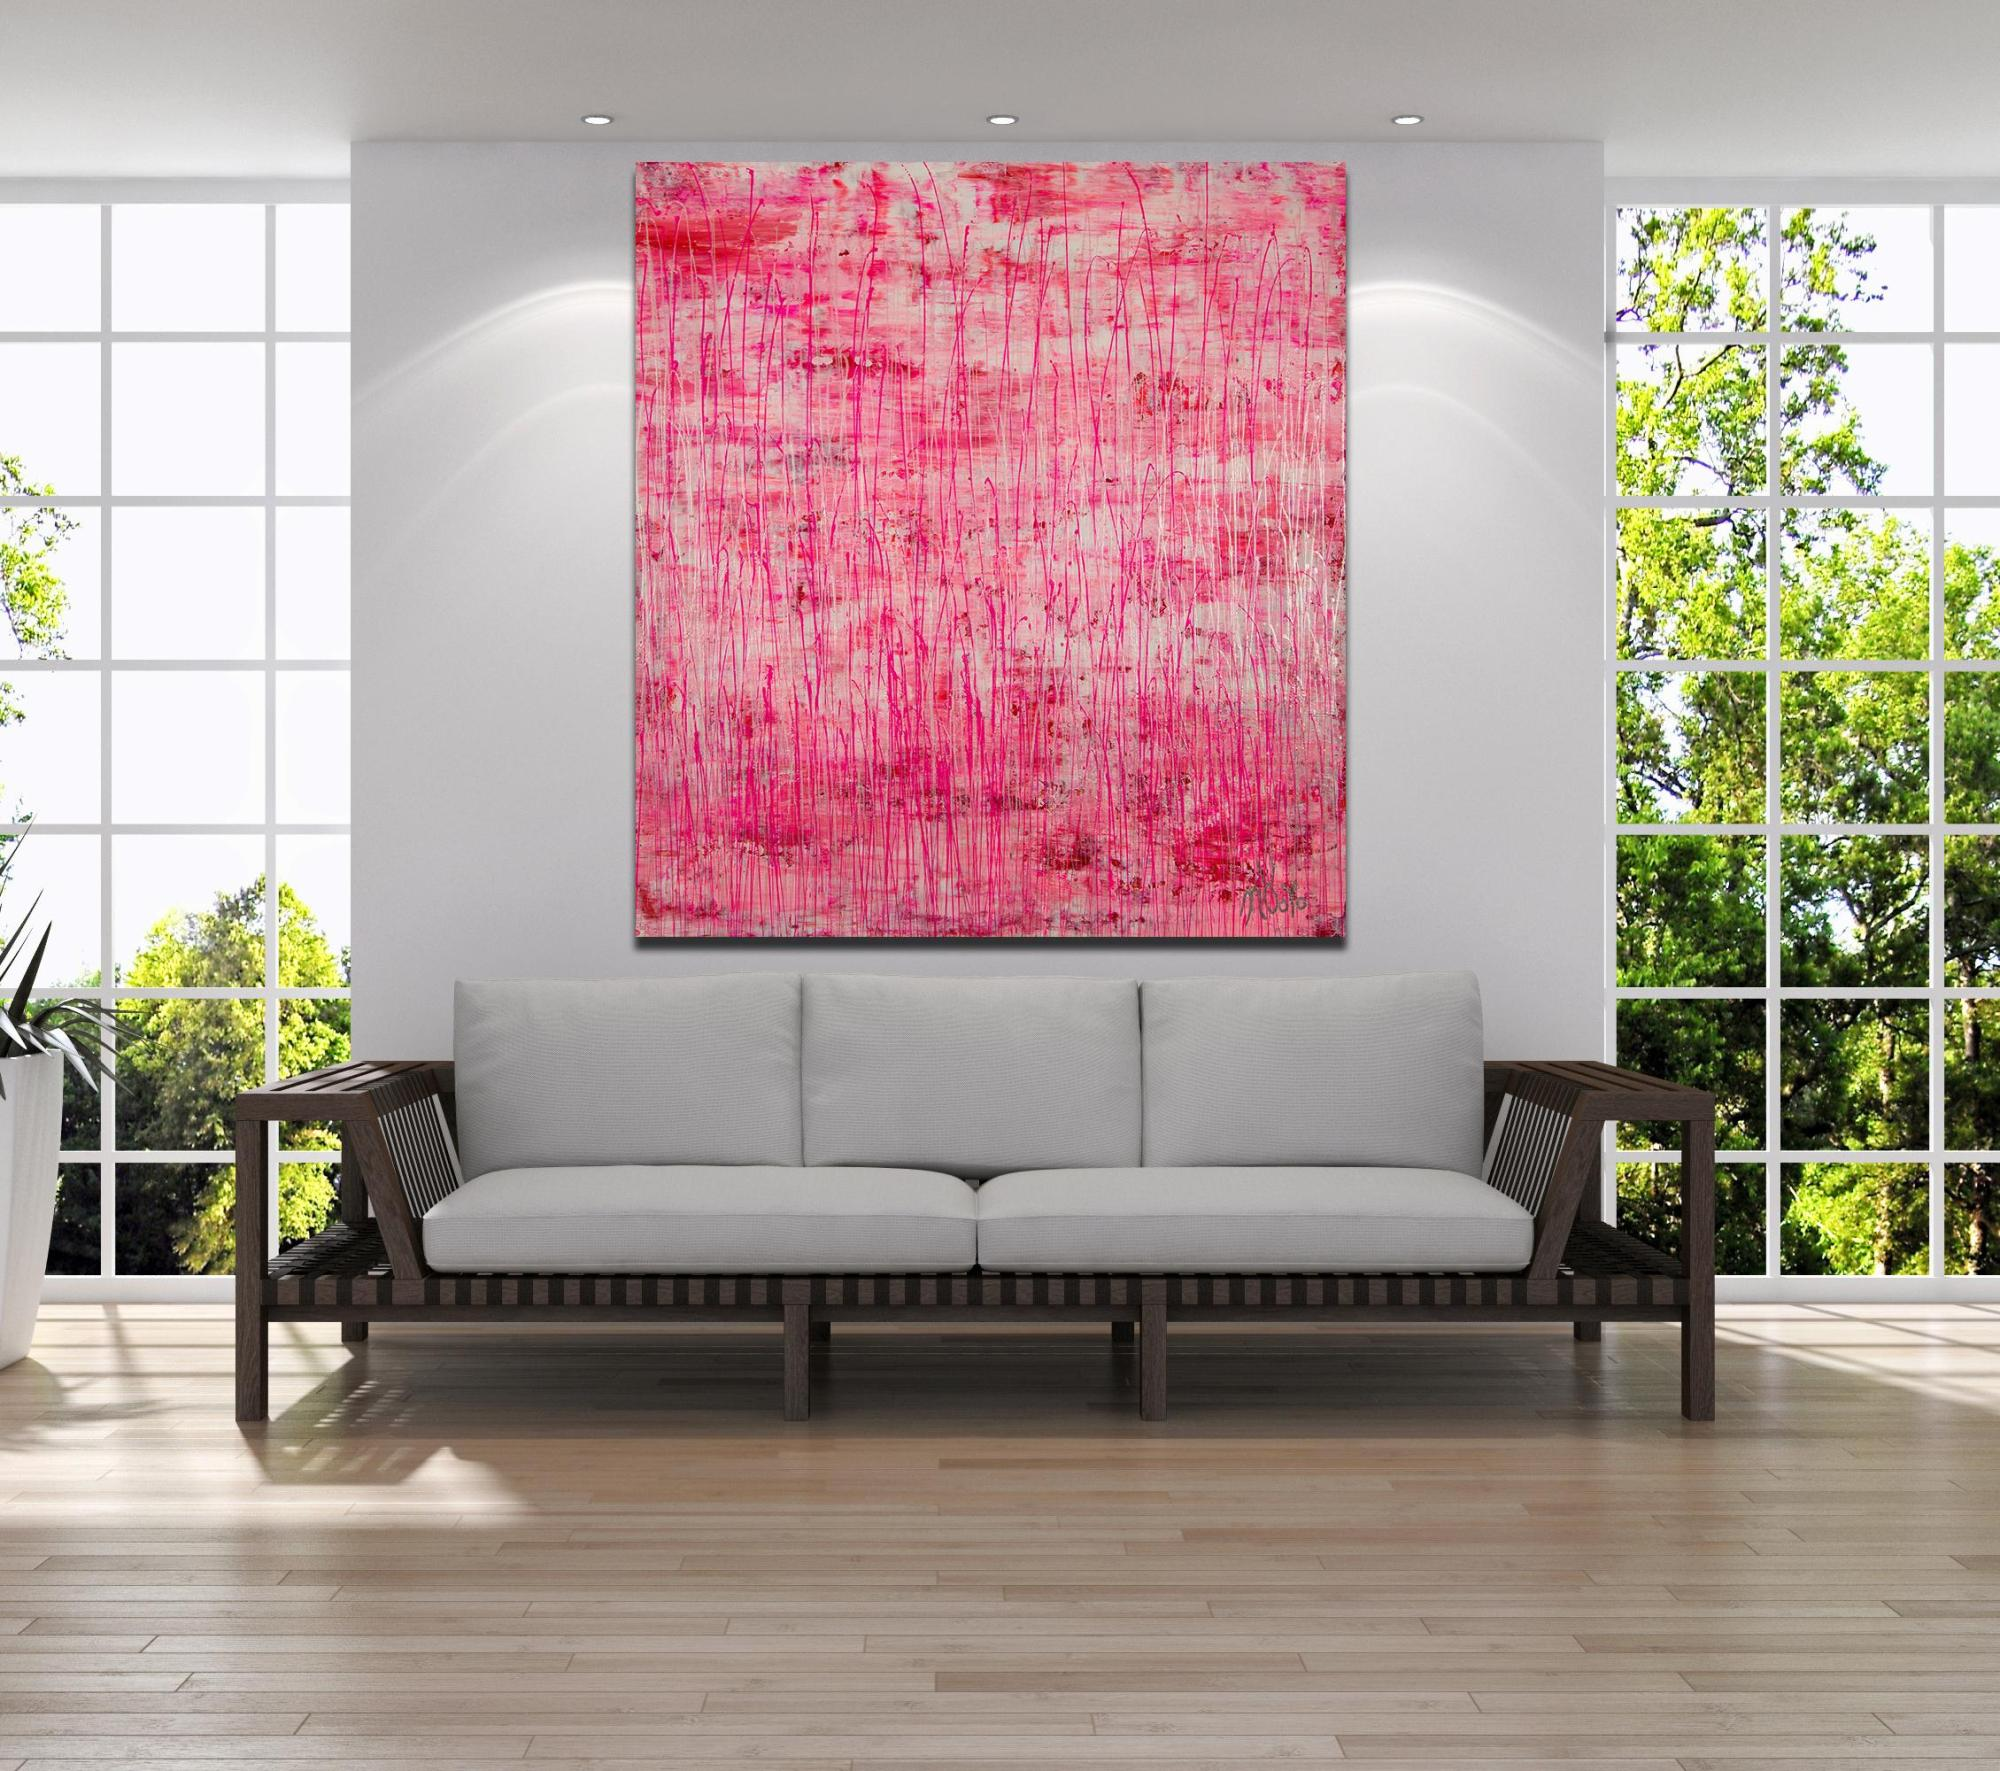 Room Example / Iridescent Drizzles (Rain in pink) (2021) / Artist - Nestor Toro